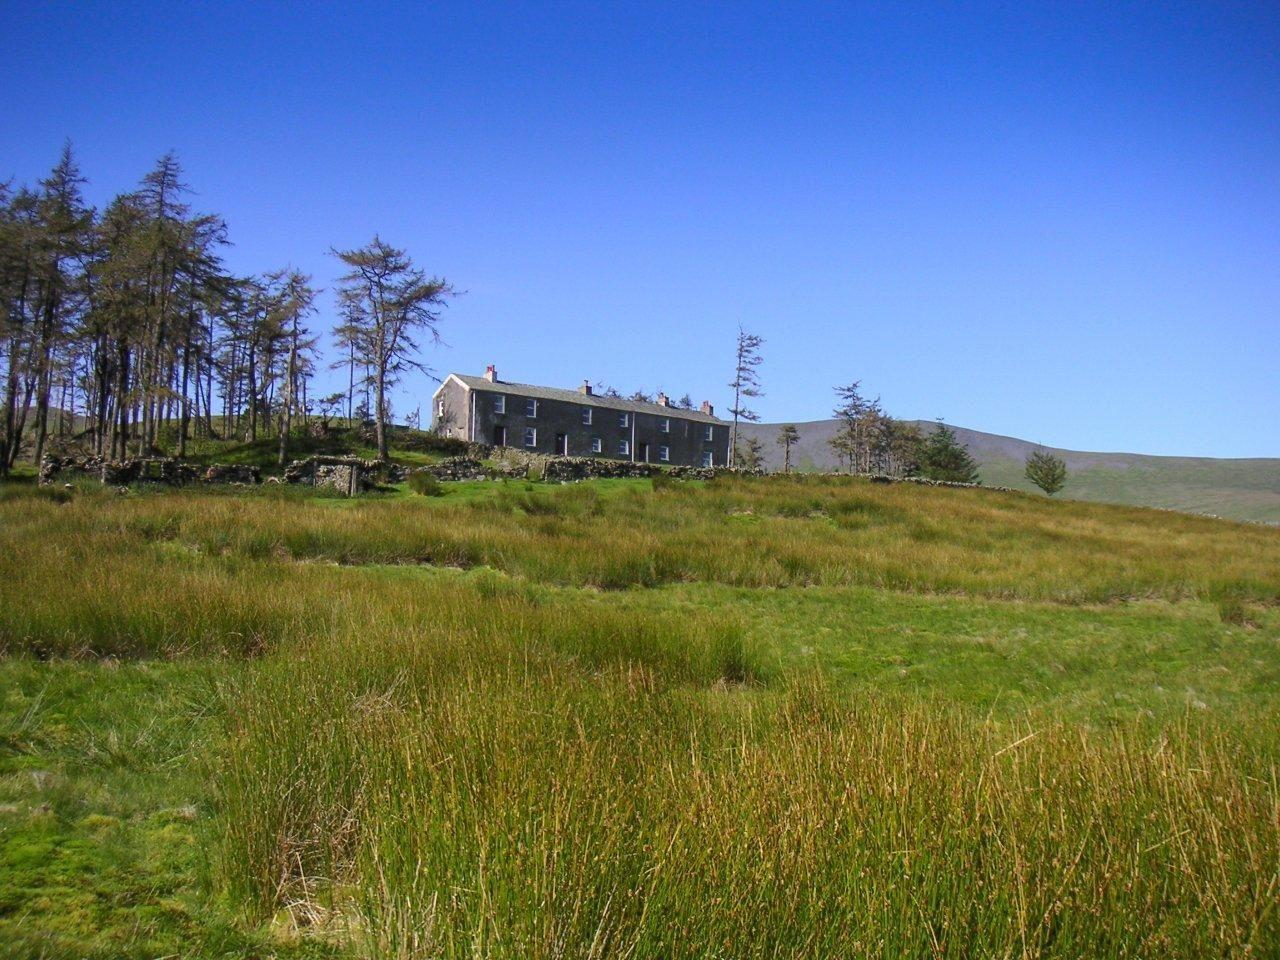 Skiddaw House